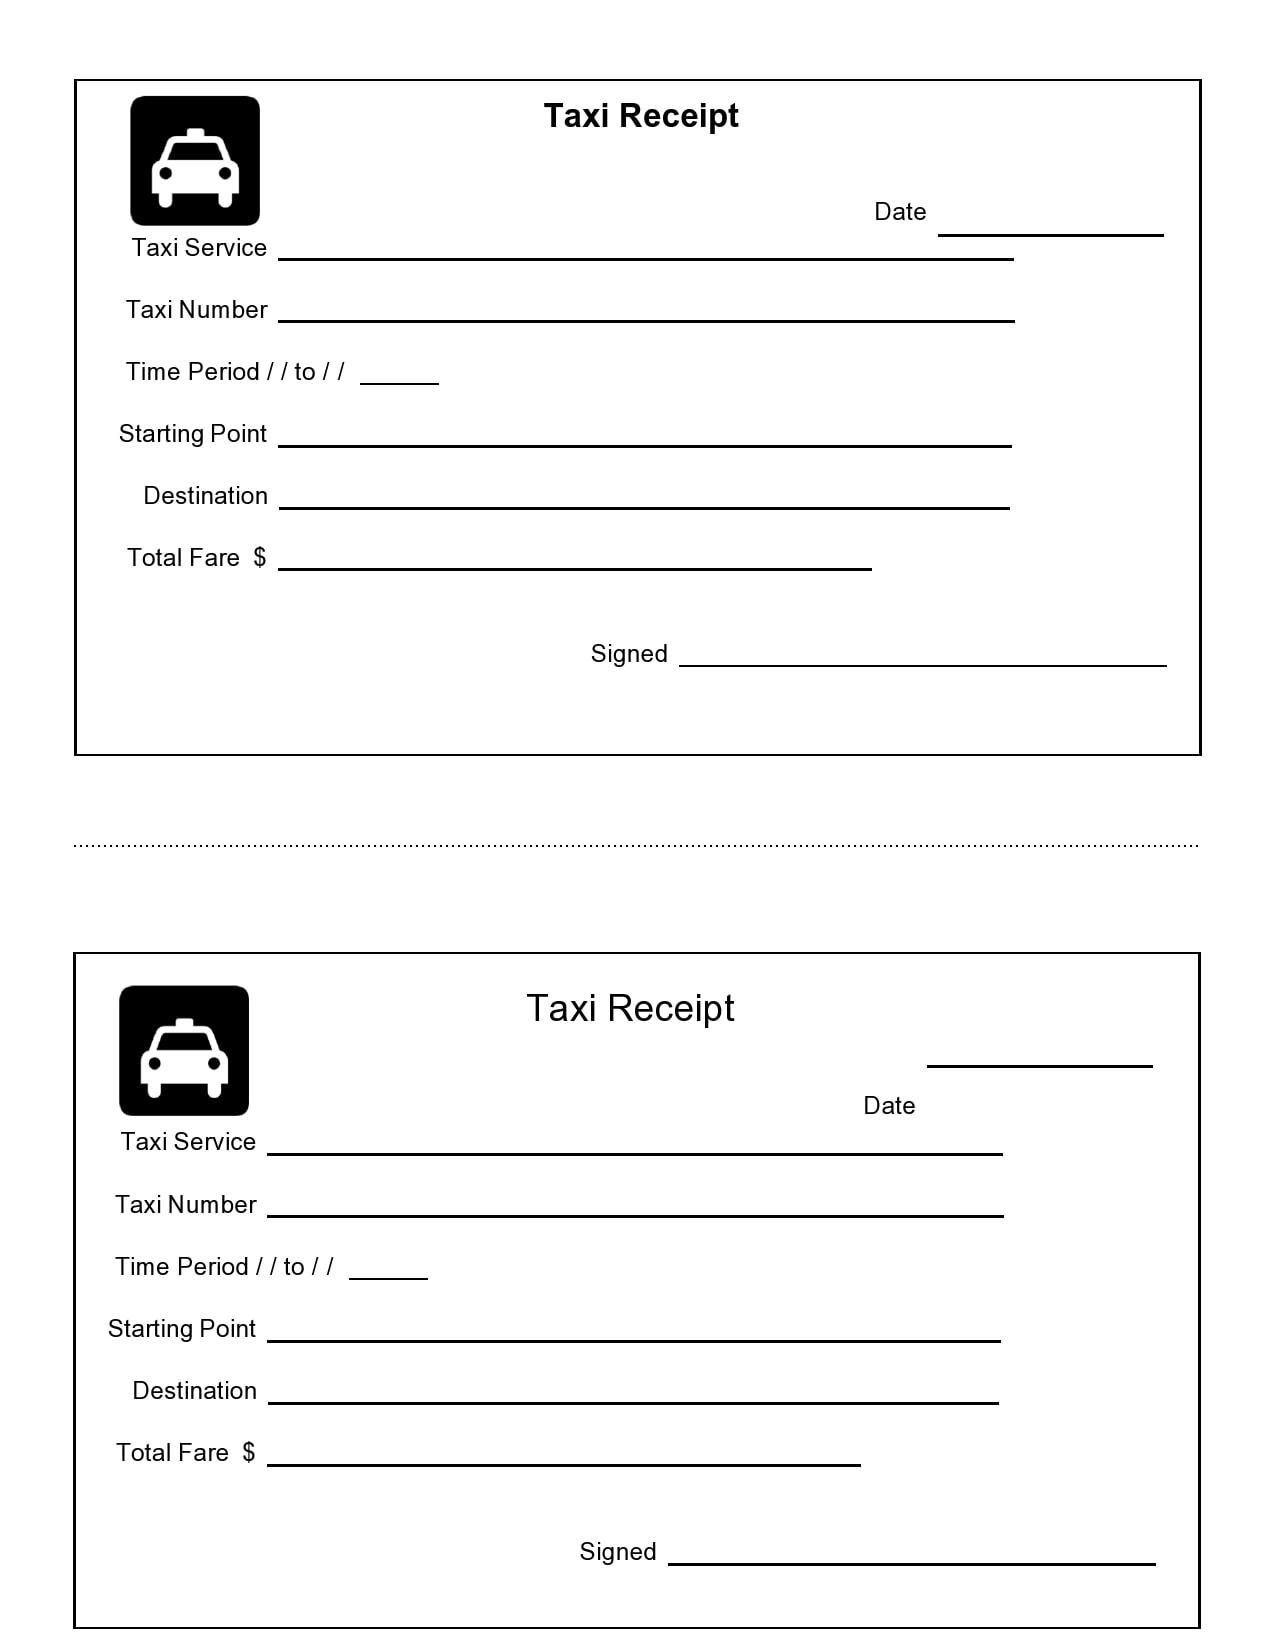 taxi receipt 11